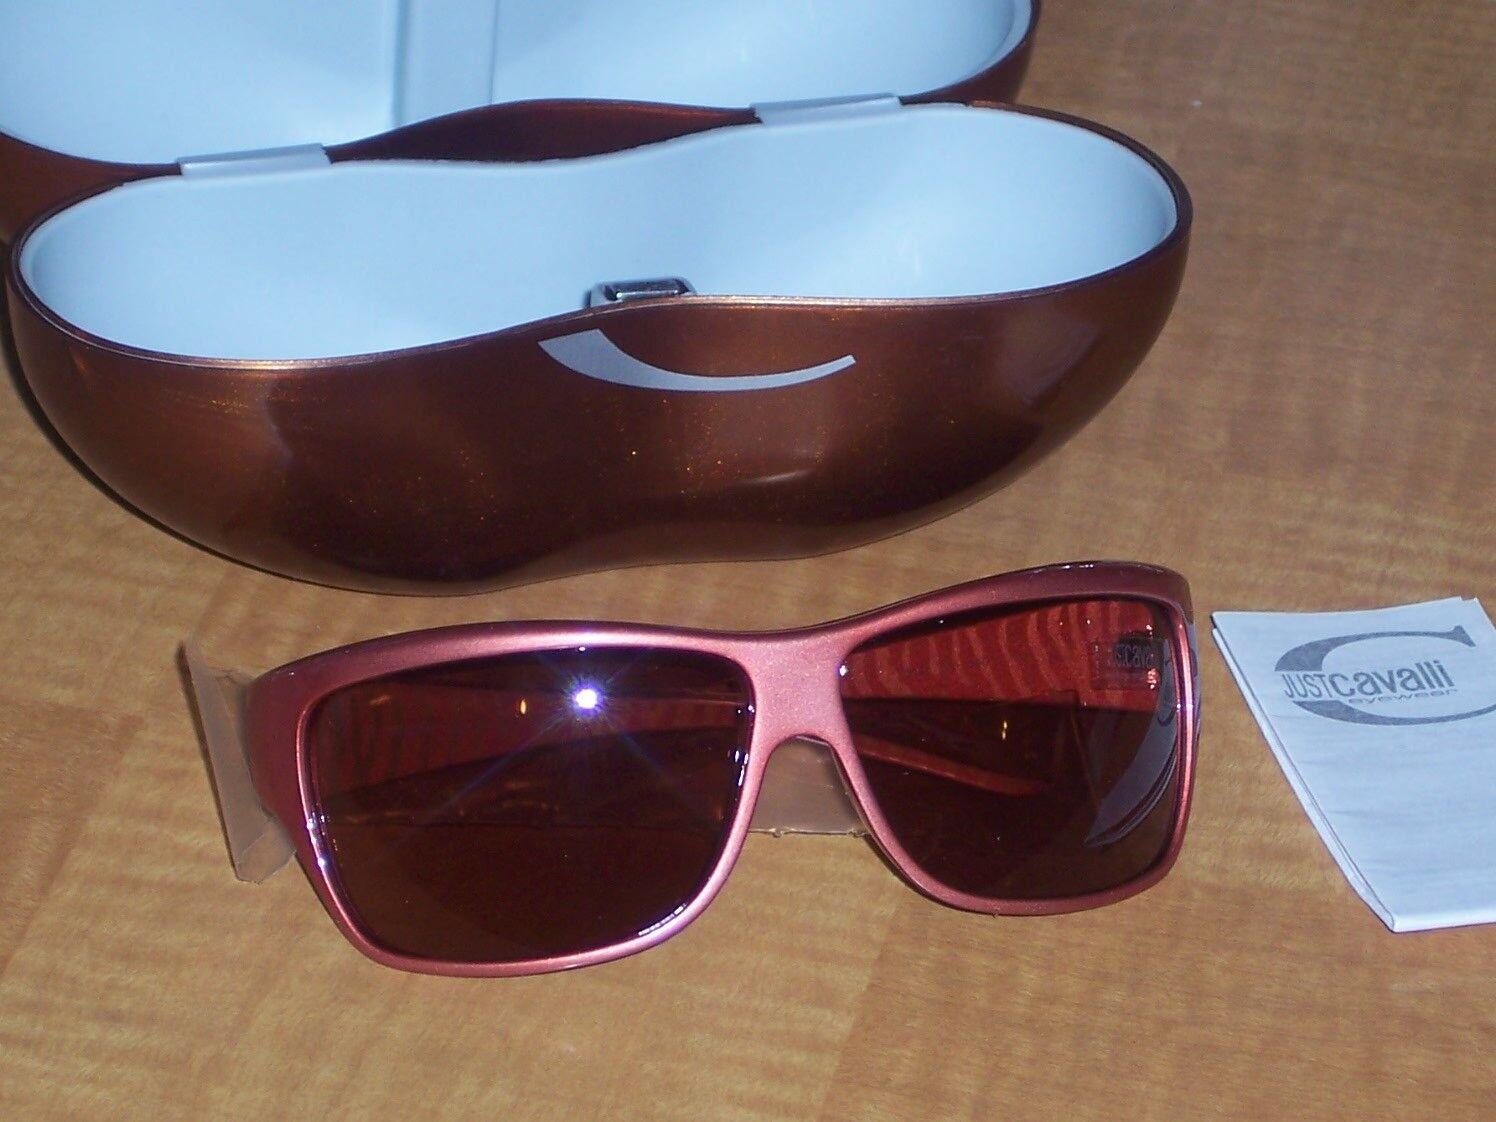 Just Cavalli Lightweight Lenses Unisex Plastic Frame Sunglasses - Uv Protection